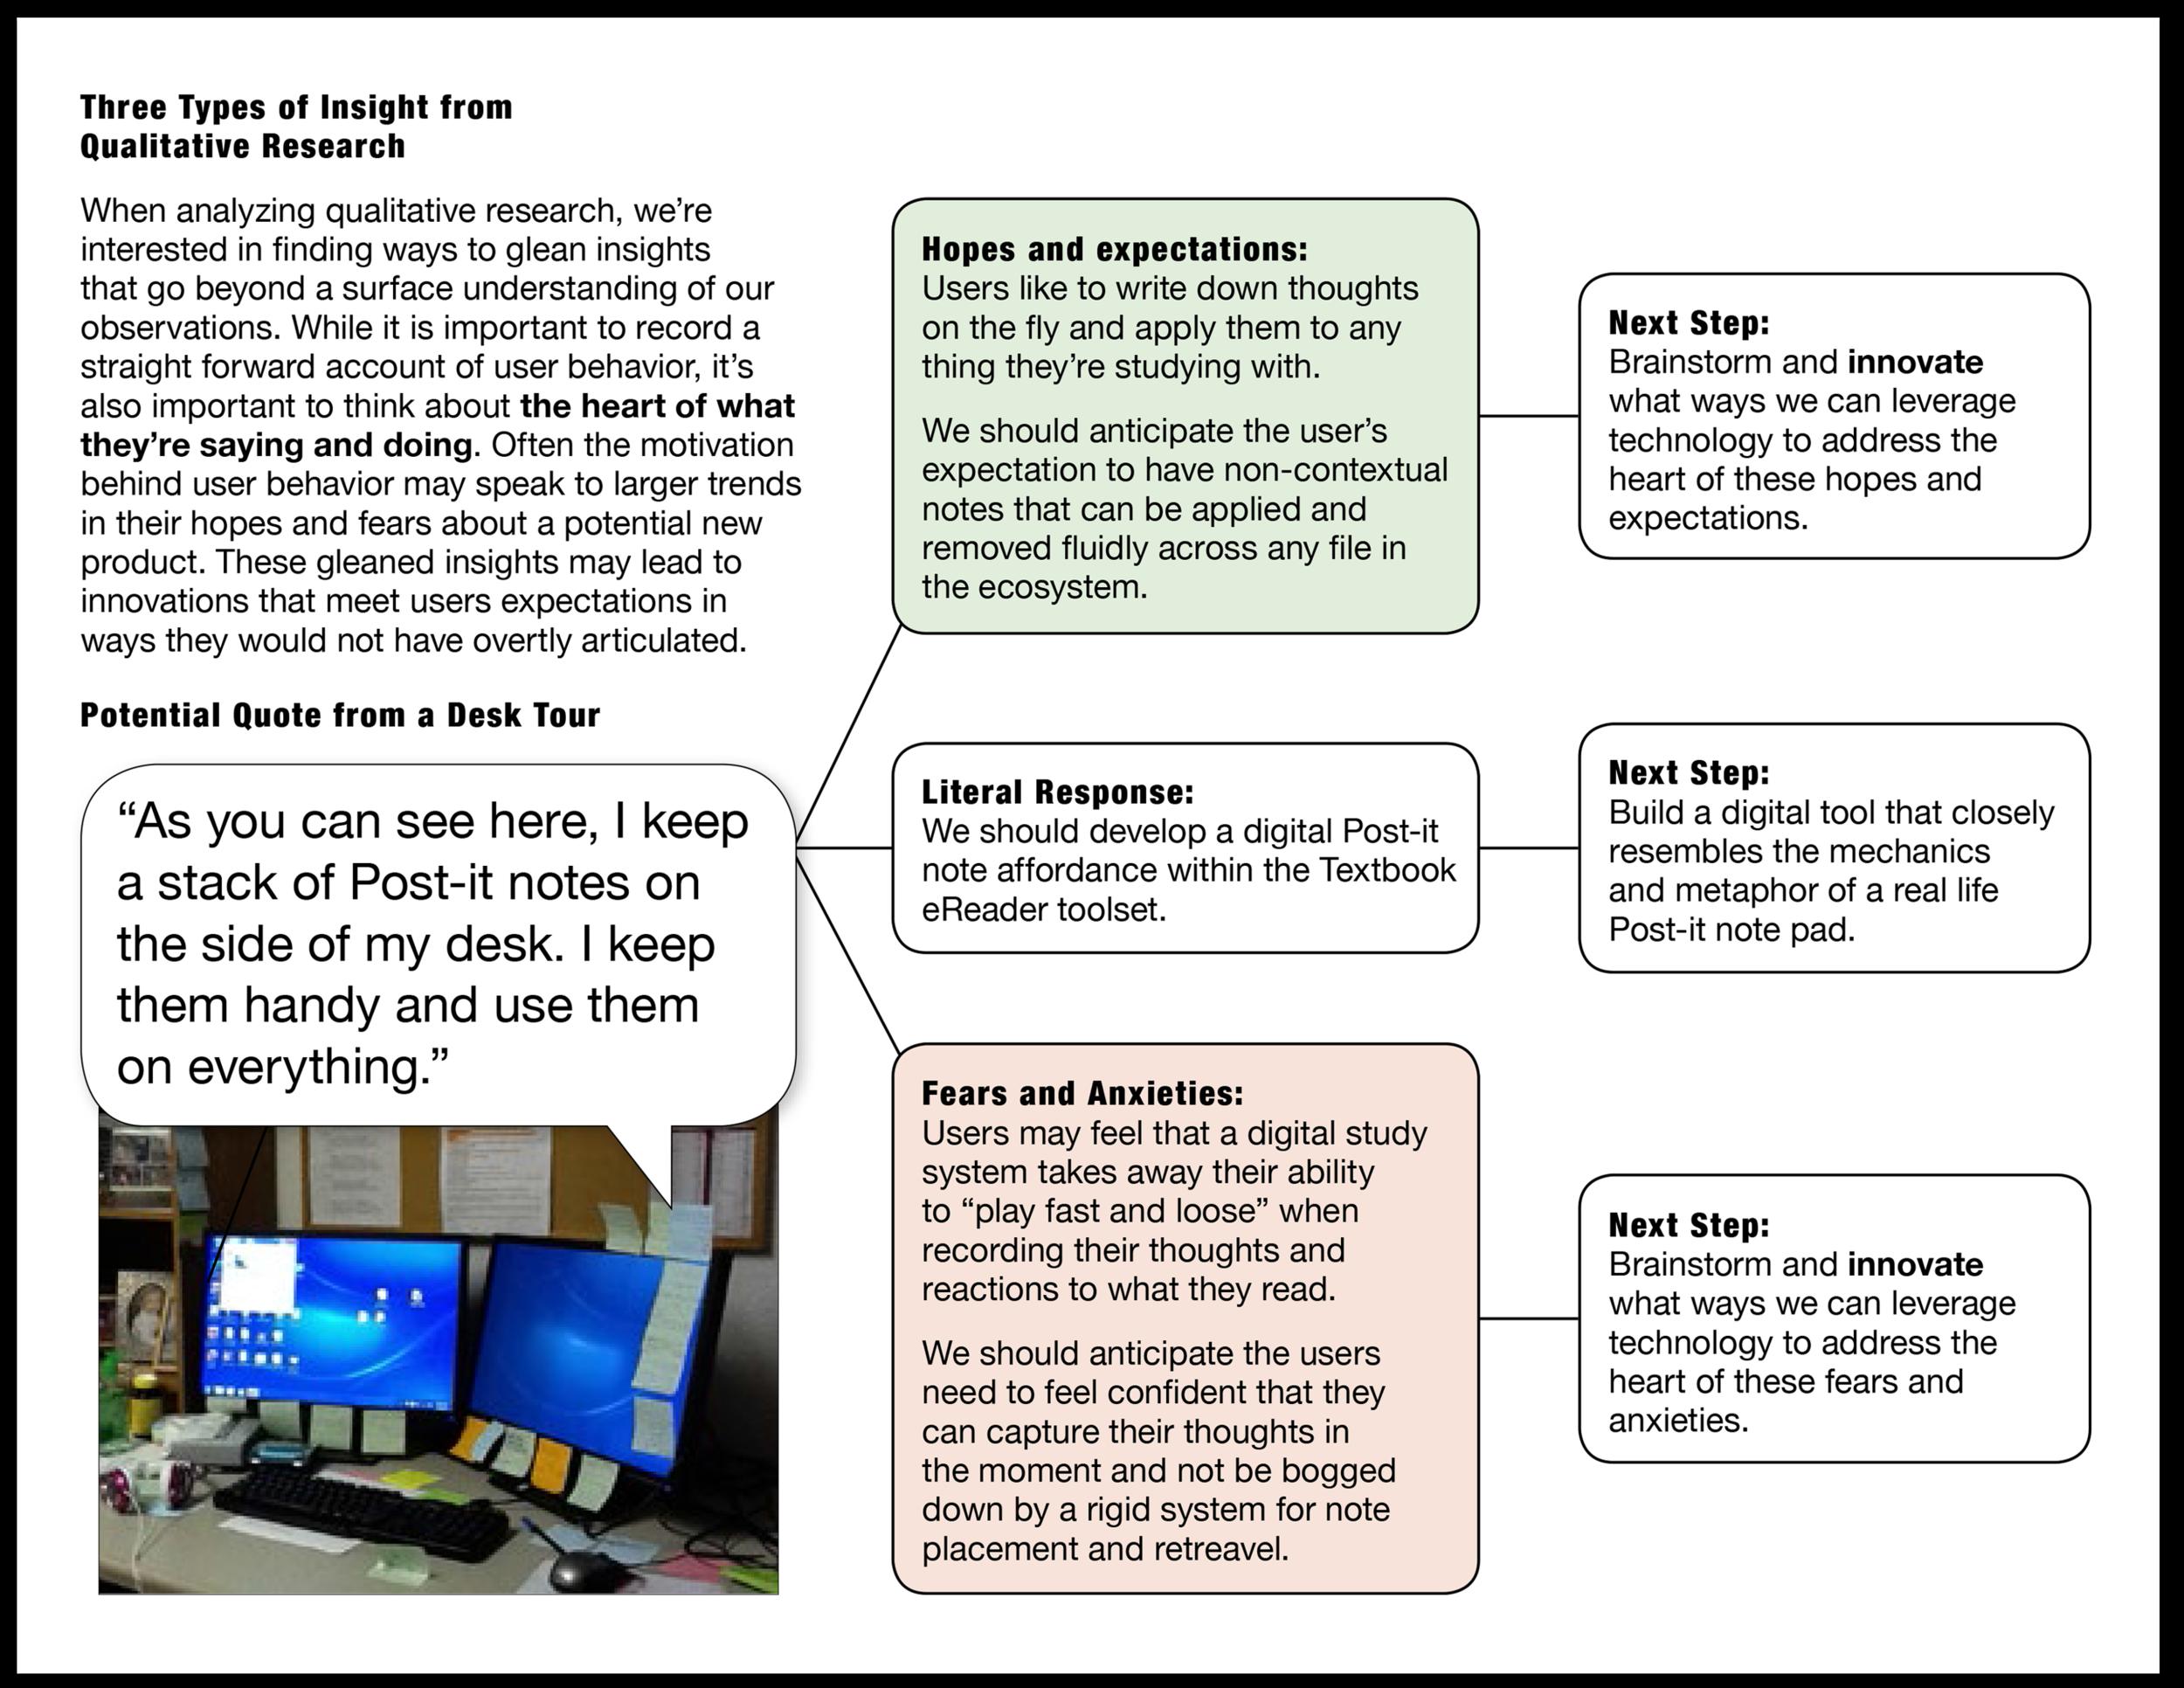 Qualitative Research One-sheet